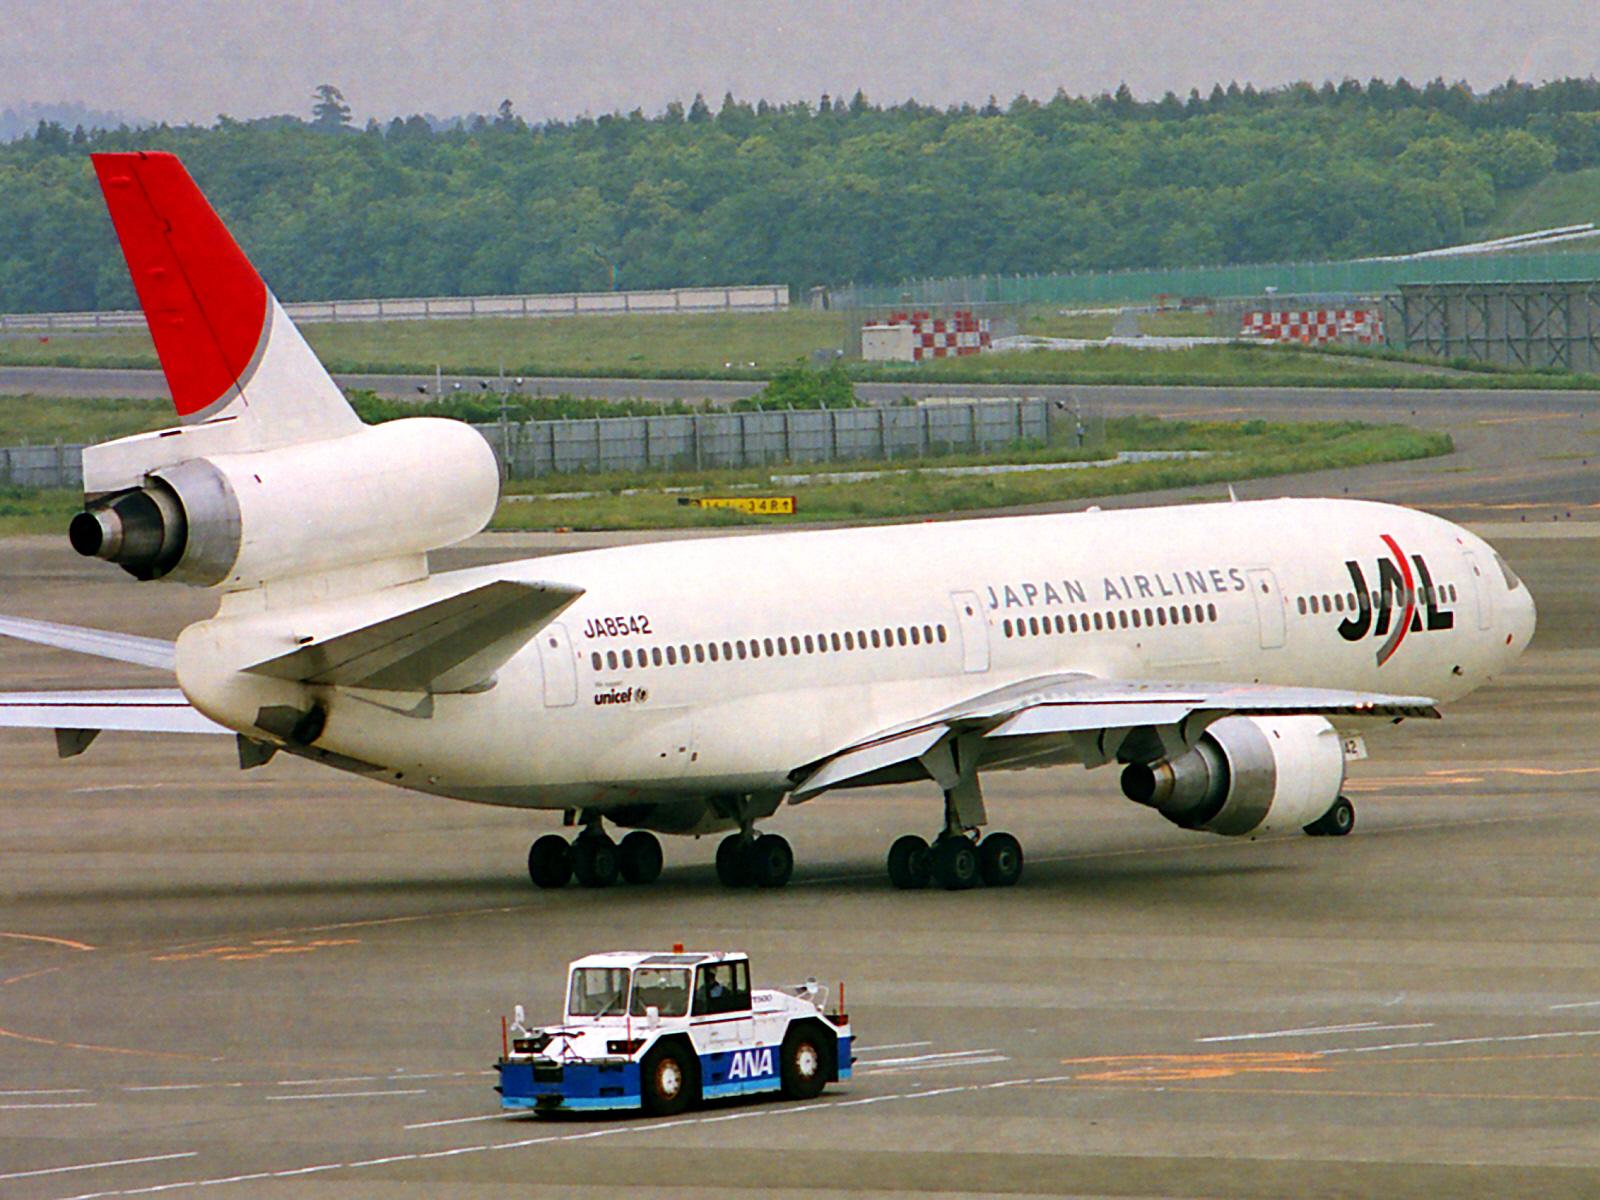 JAL-JA8542-McDonnell-Douglas-DC-10-40I-NRT-12446_src_12446